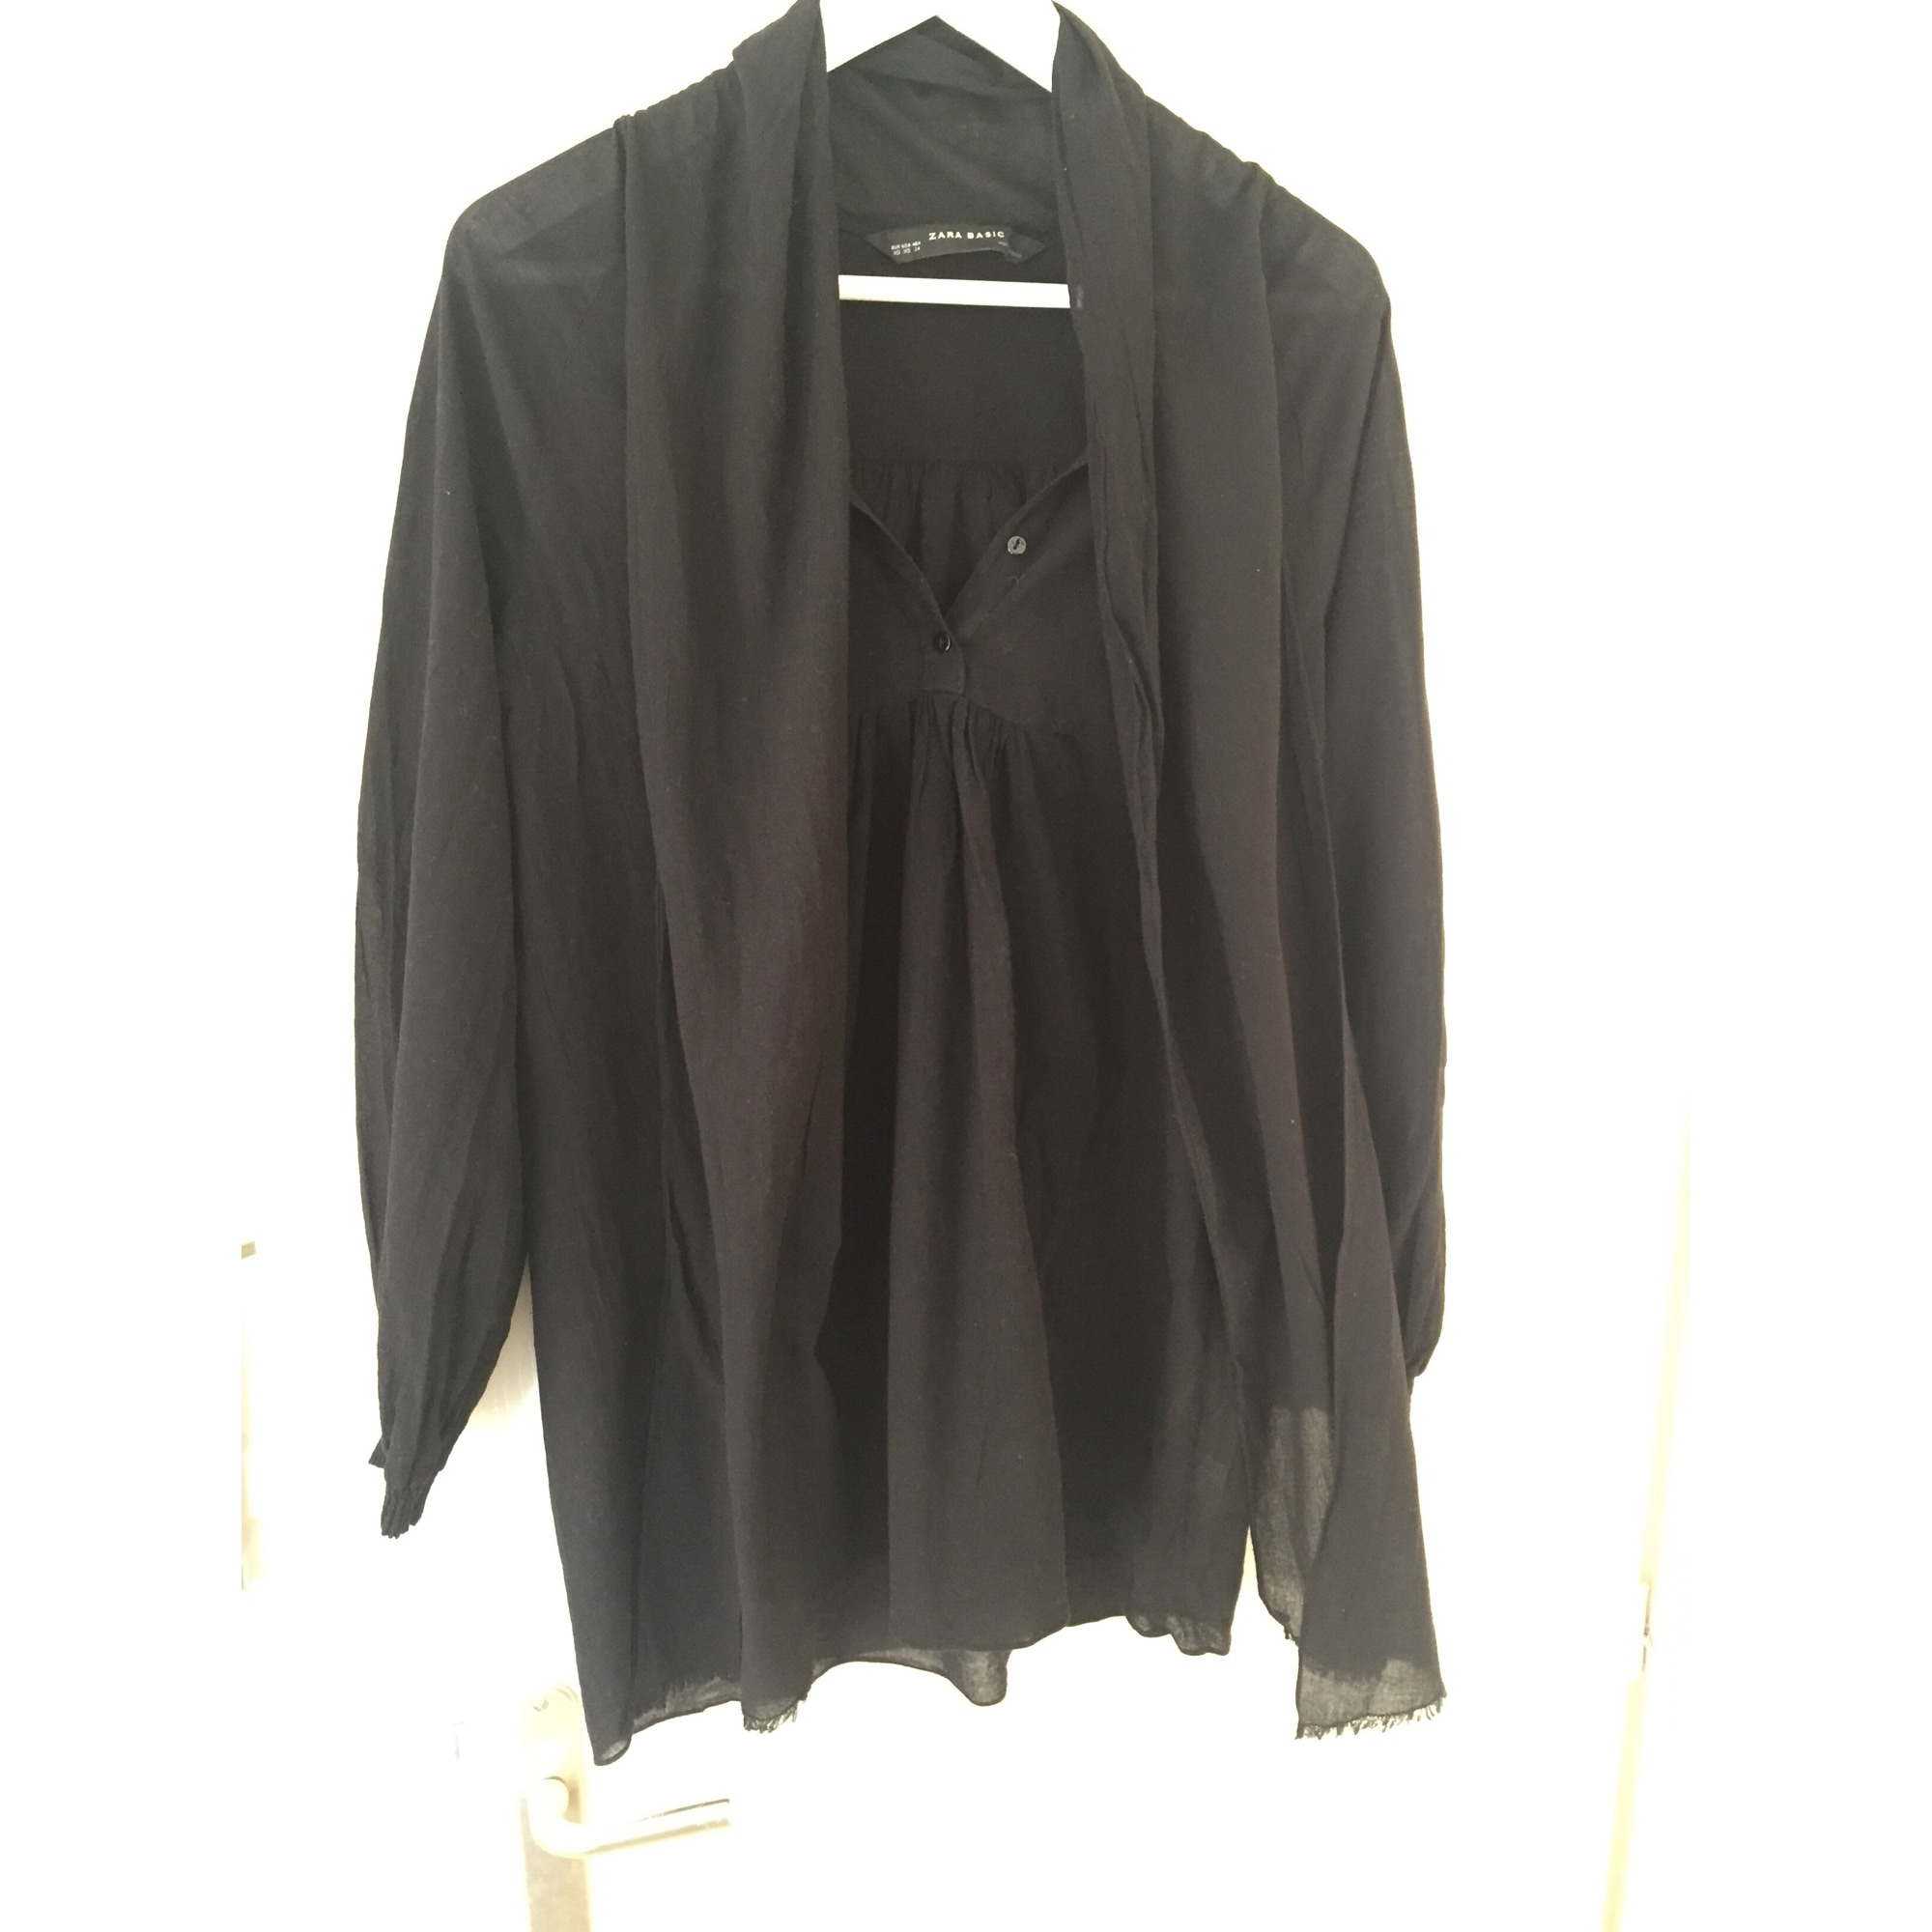 Uvpsqzmg Robe 34xst0noir 7363513 Zara Tunique 13FJTlcK